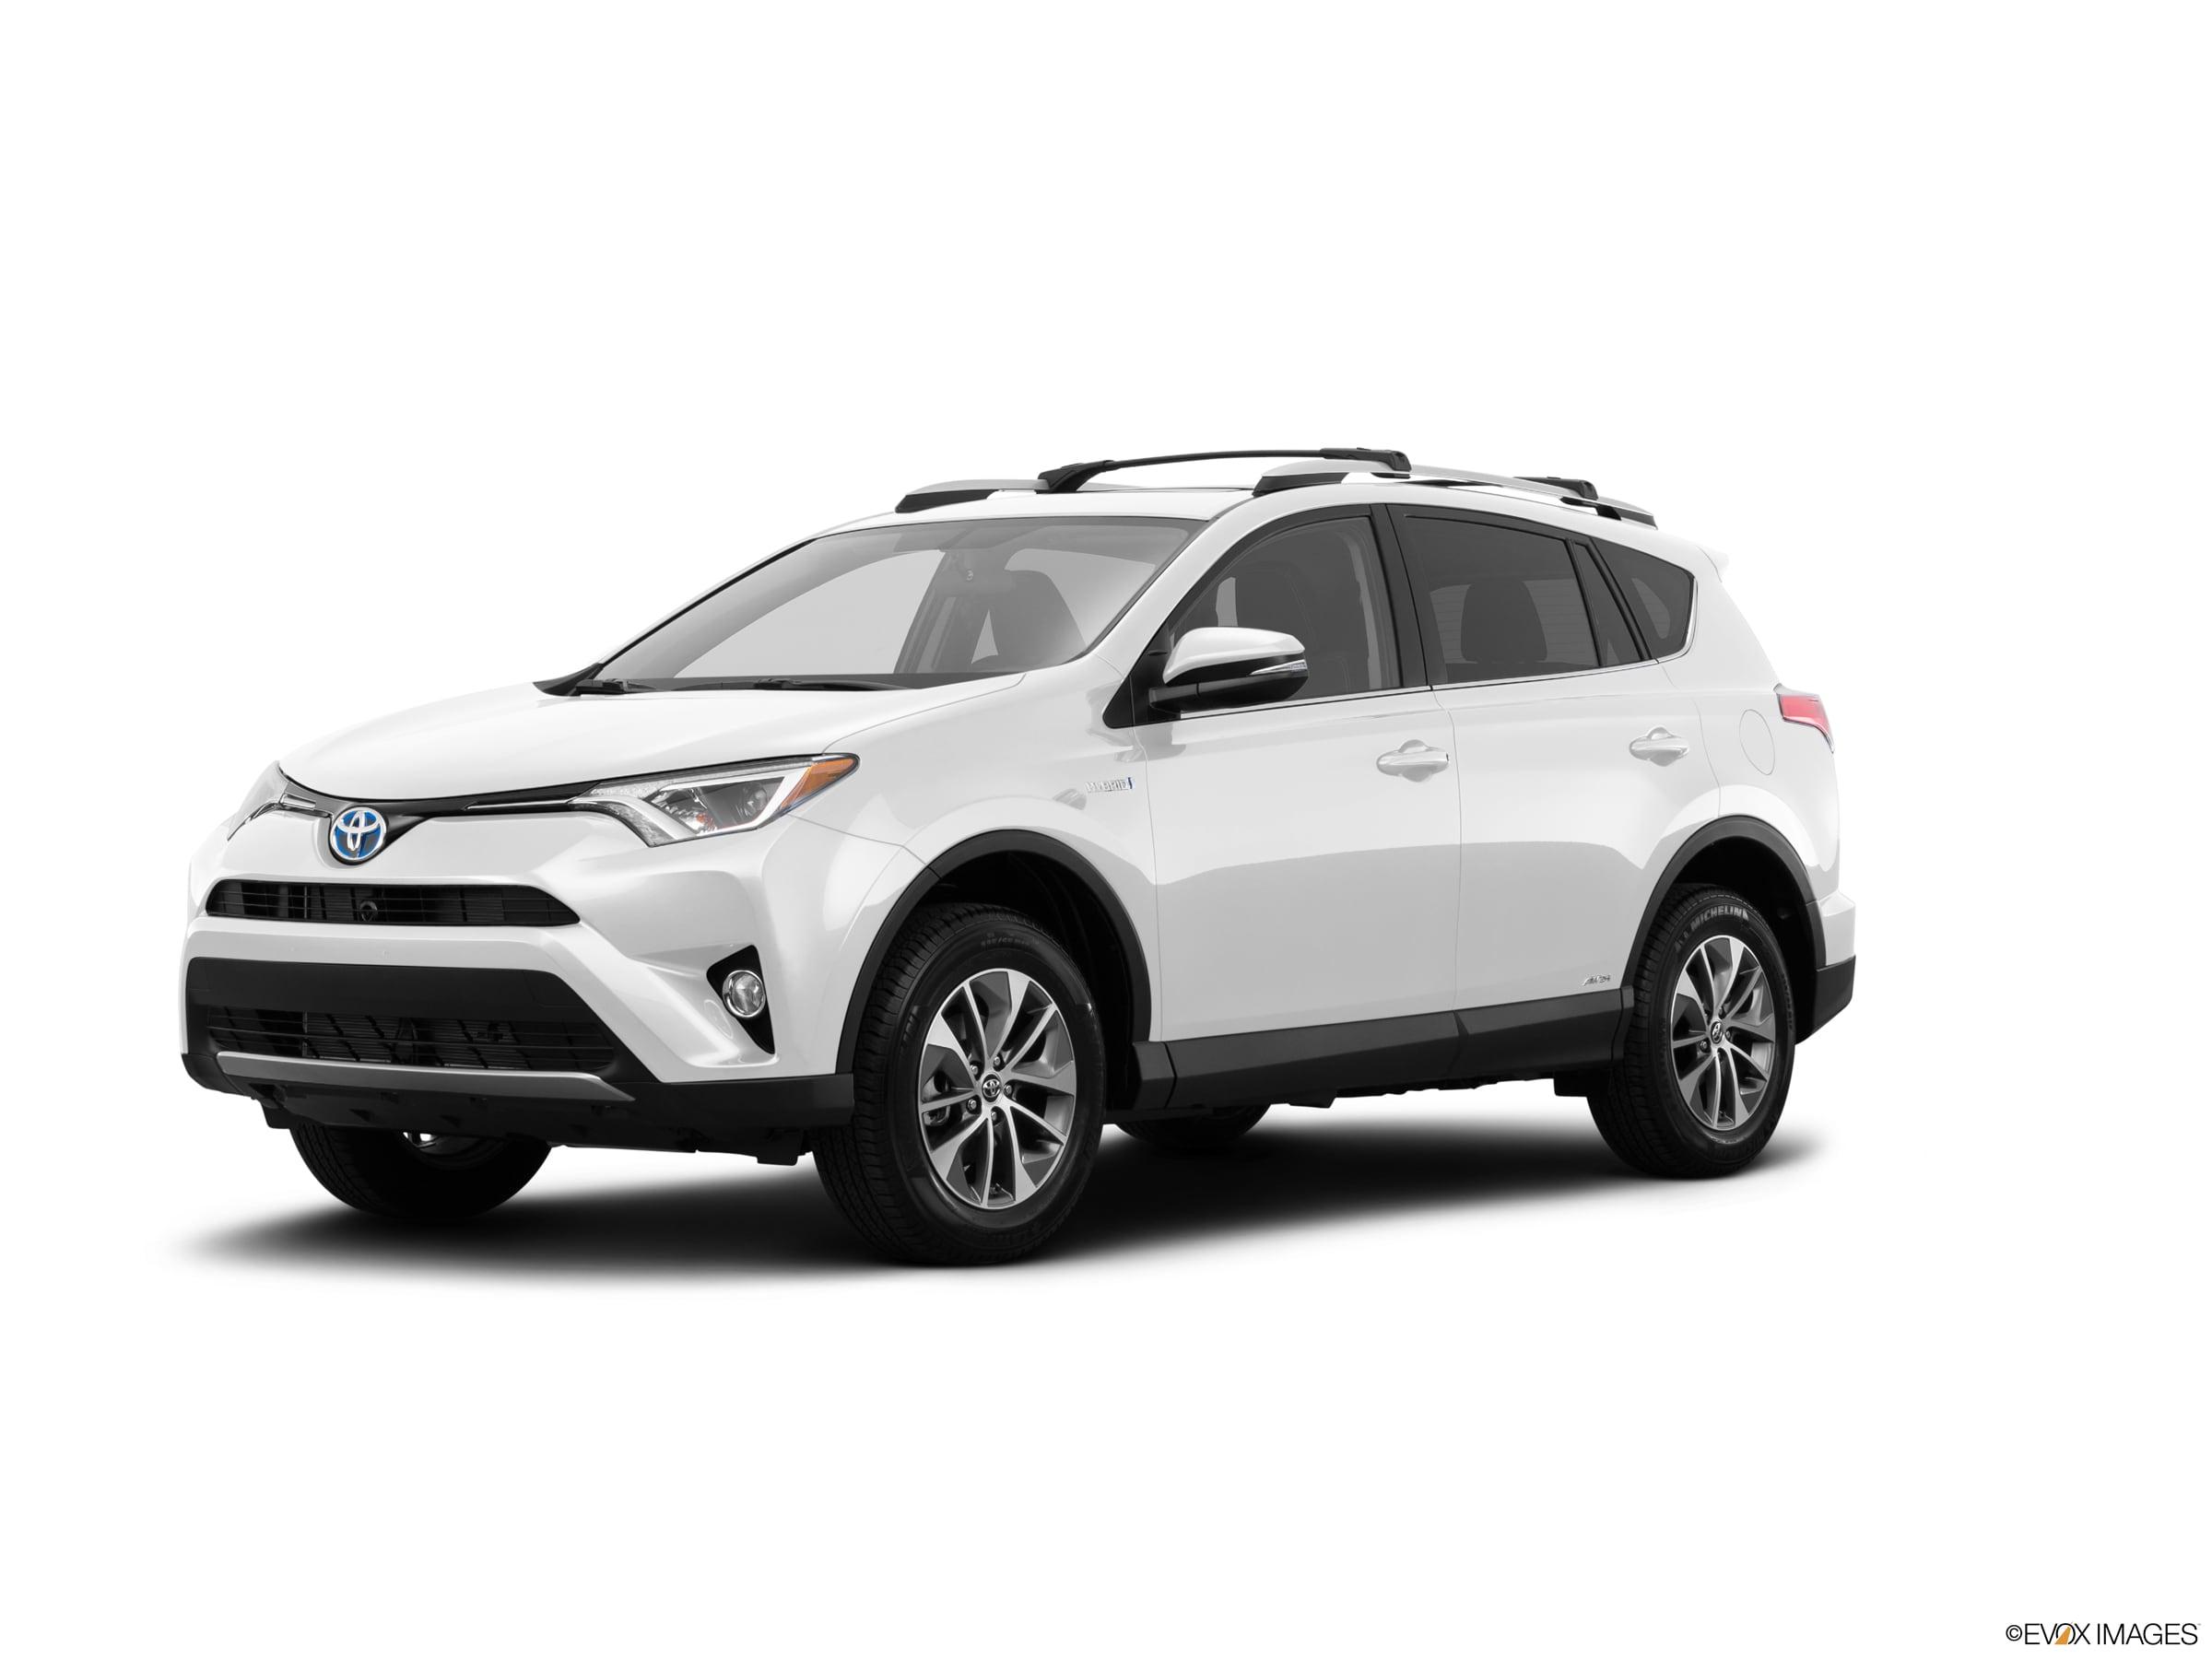 Certified 2017 Toyota RAV4 XLE with VIN JTMRFREVXHJ713153 for sale in Maplewood, Minnesota